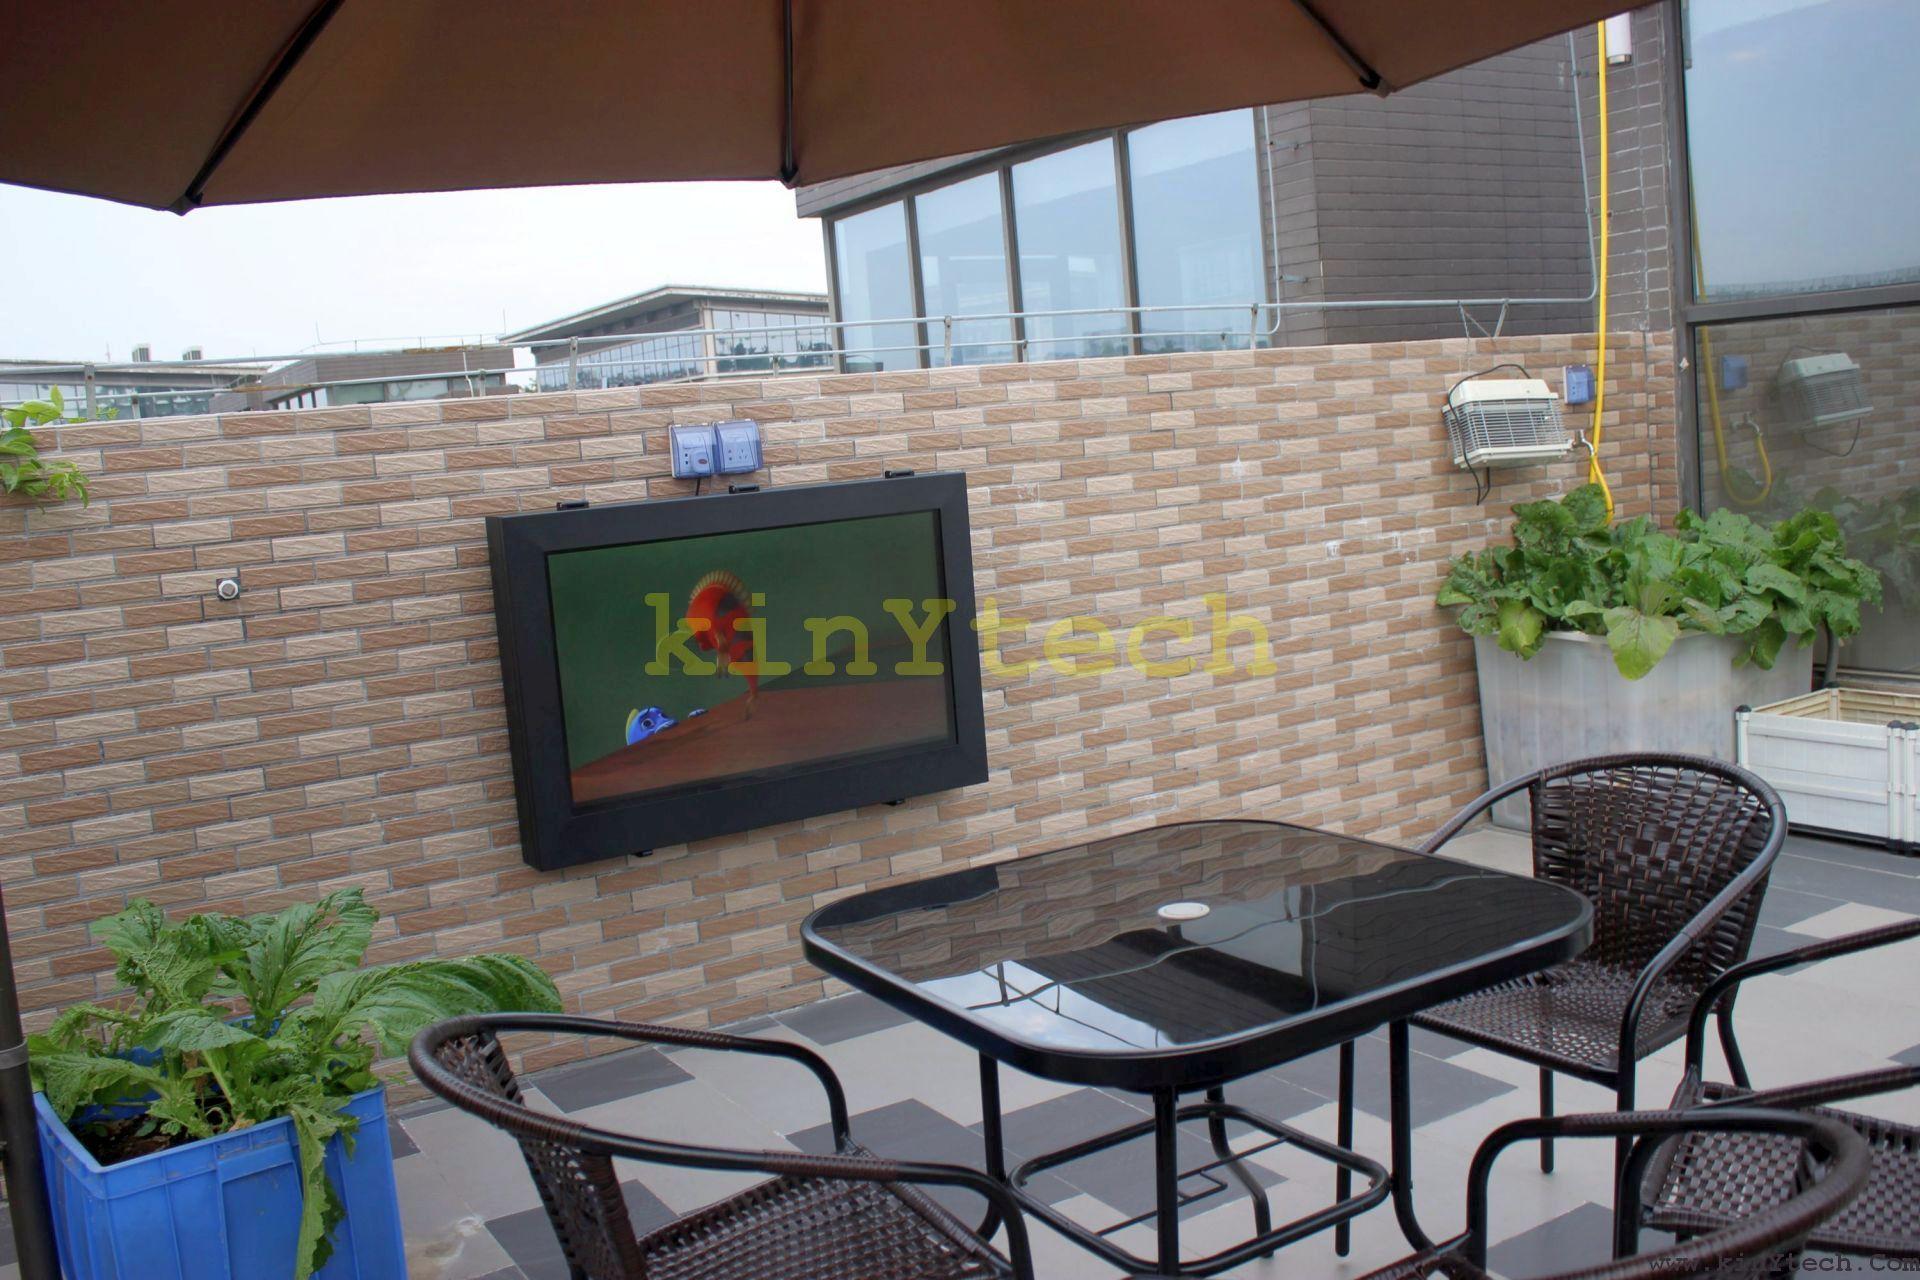 Outdoor Tv Enclosure,Outdoor Tv Mount,Weatherproof Tv Enclosure,Outdoor Screen Enclosure,